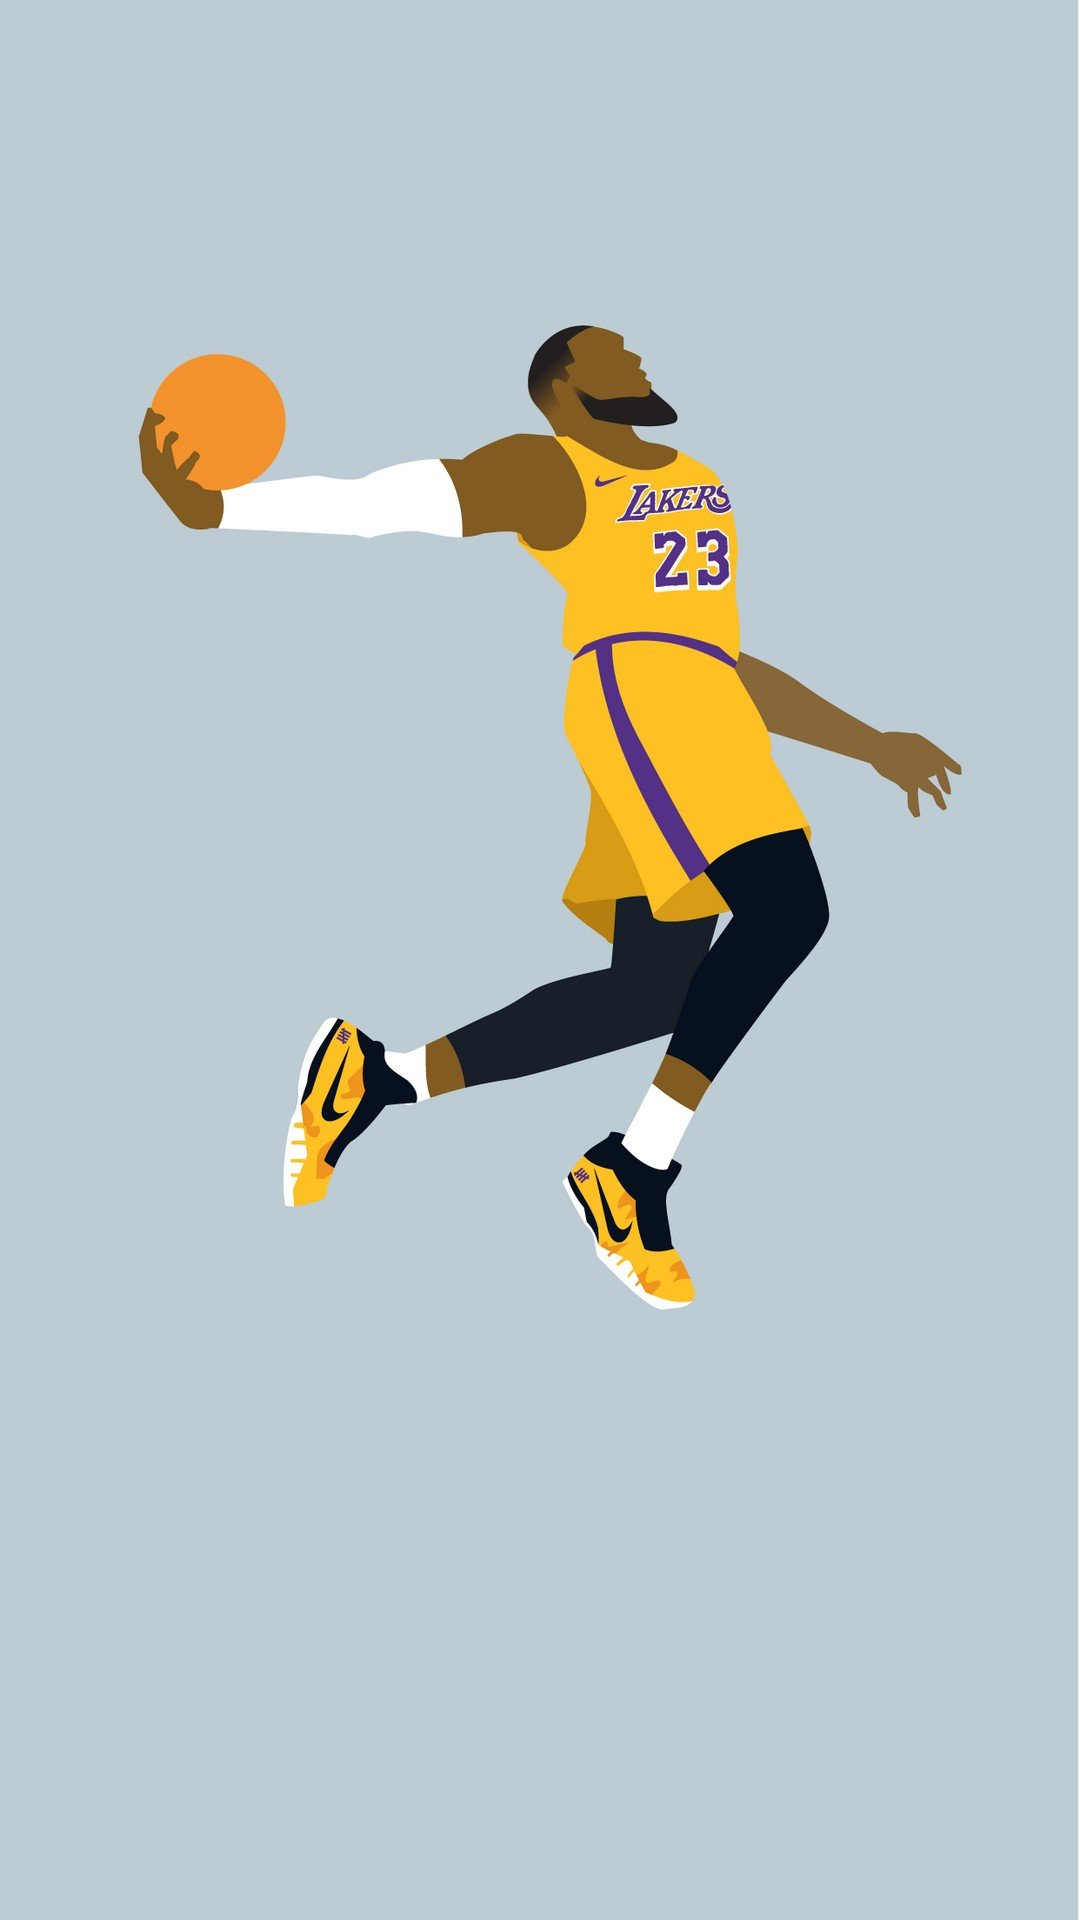 iPhone Wallpaper HD LeBron James LA Lakers 2020 Basketball Wallpaper 1080x1920